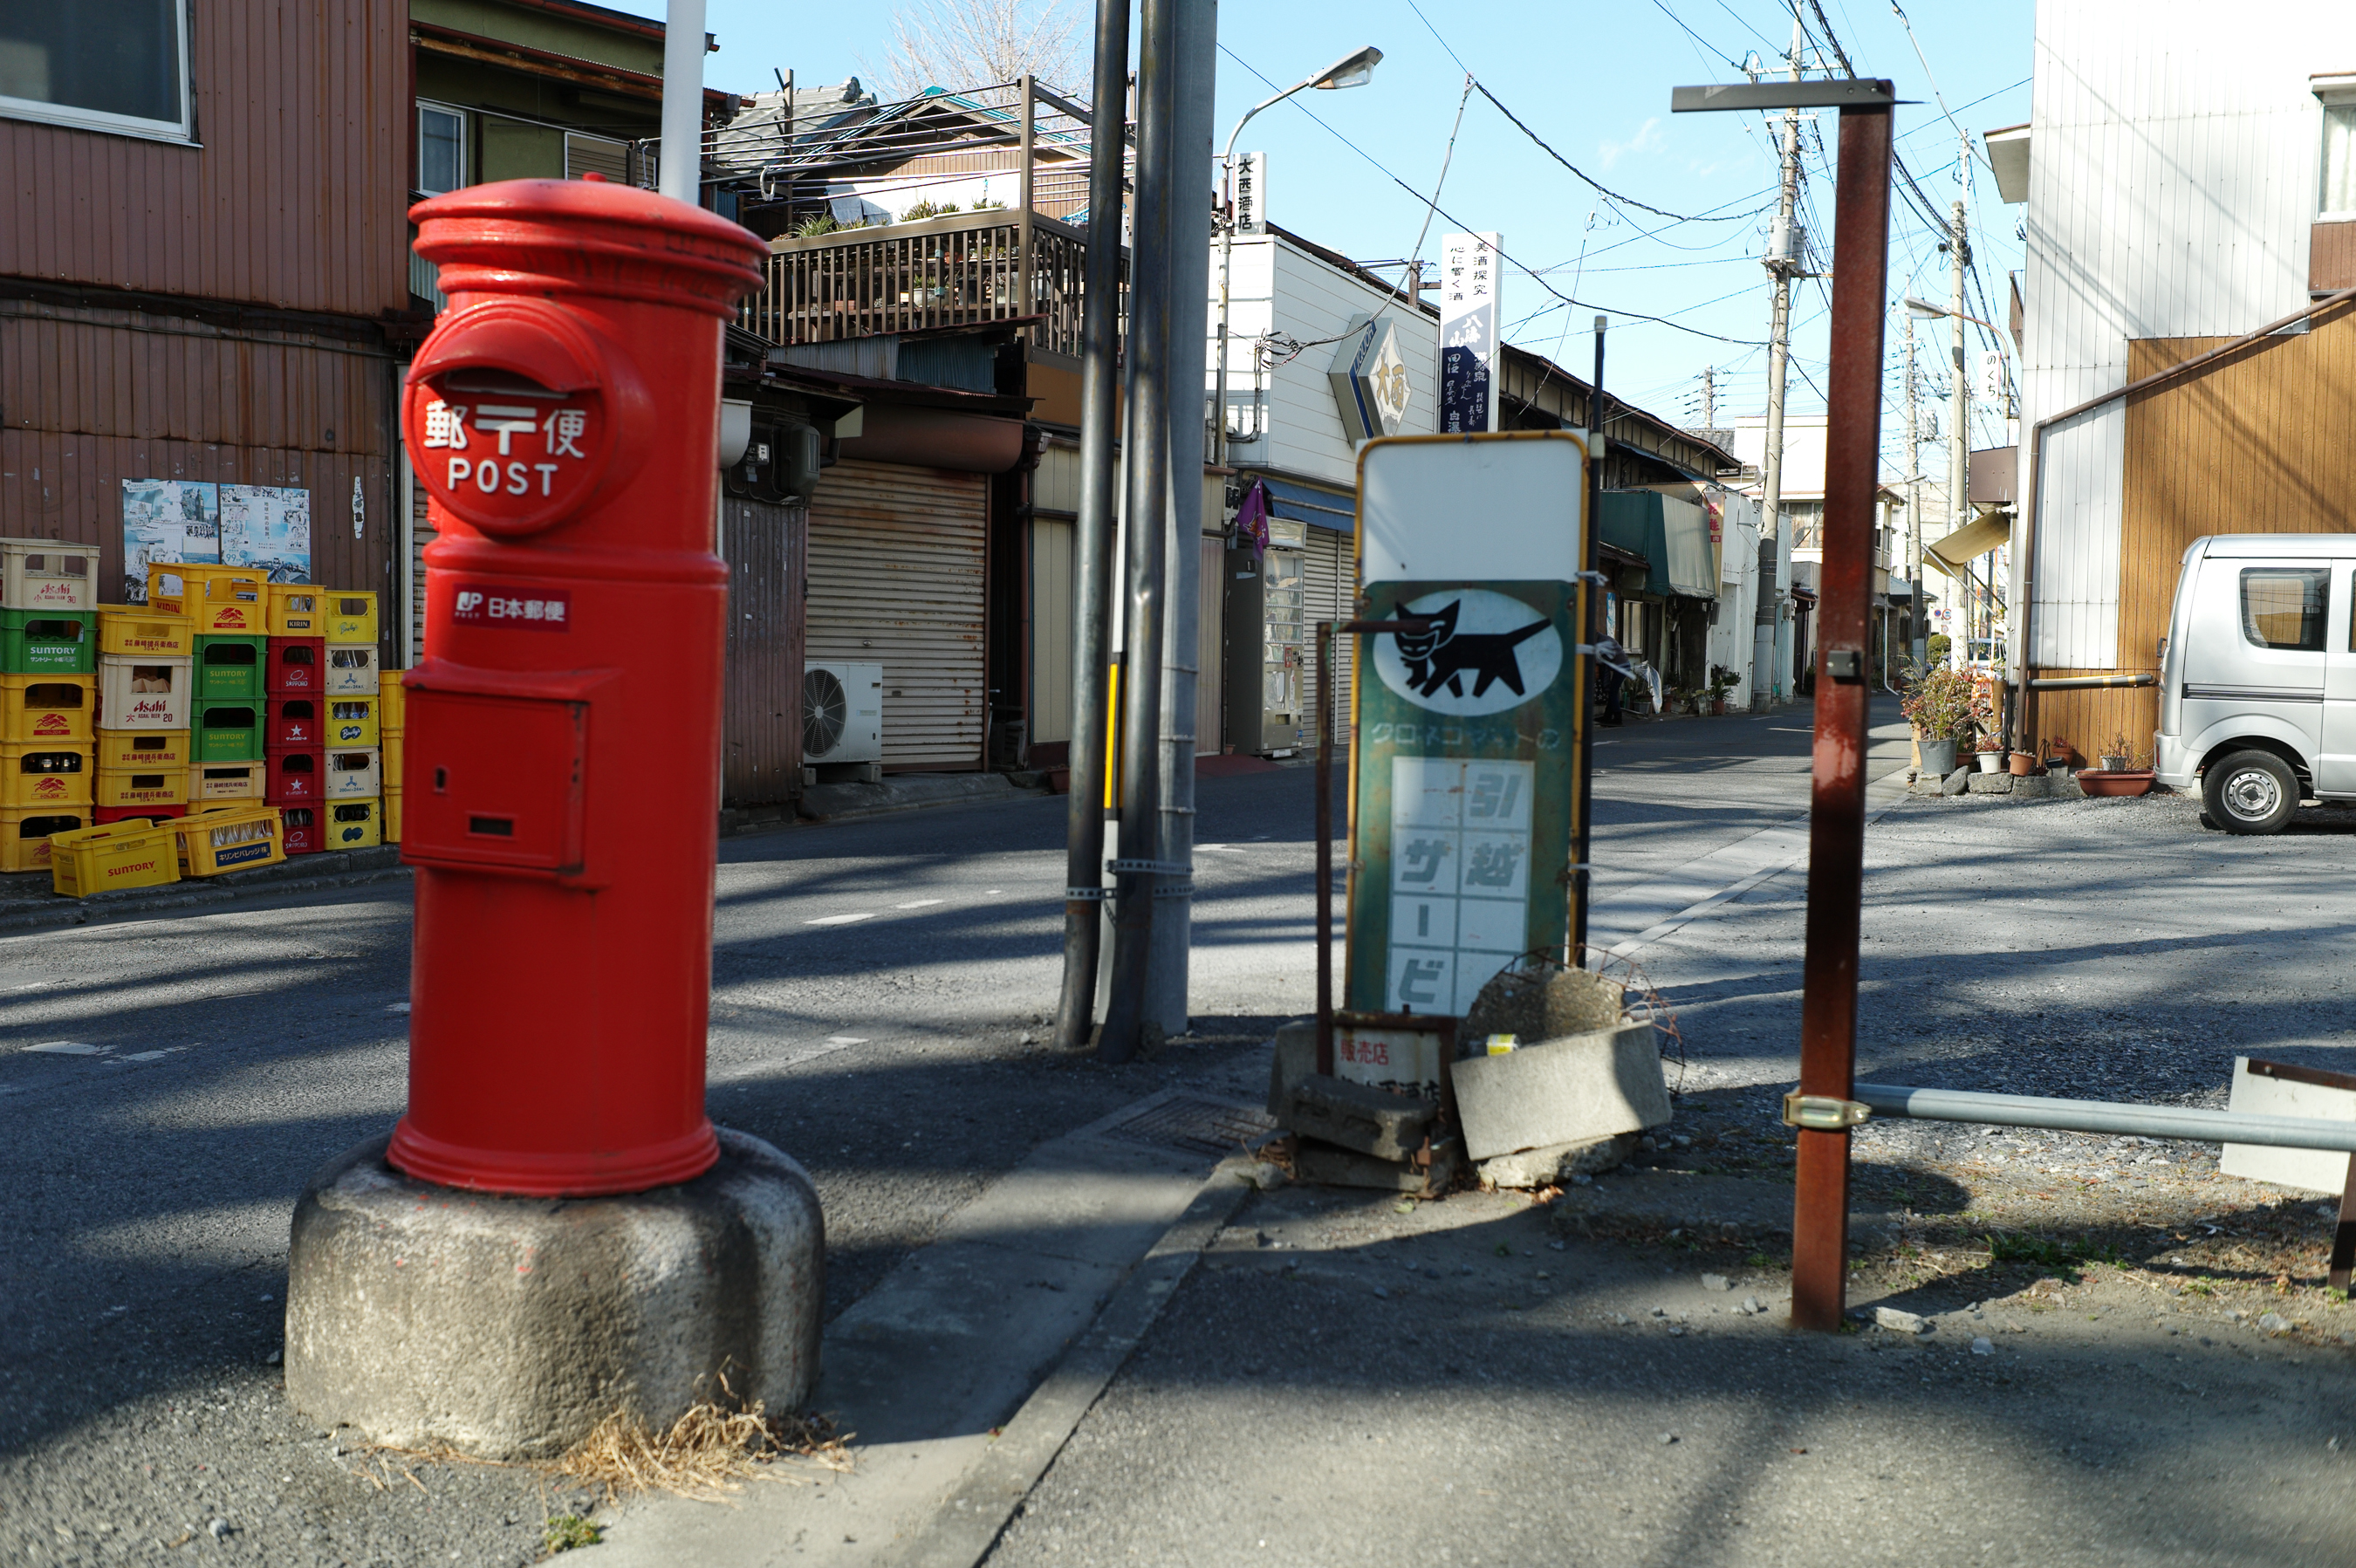 f:id:aoyama-takuro:20180211225439j:plain